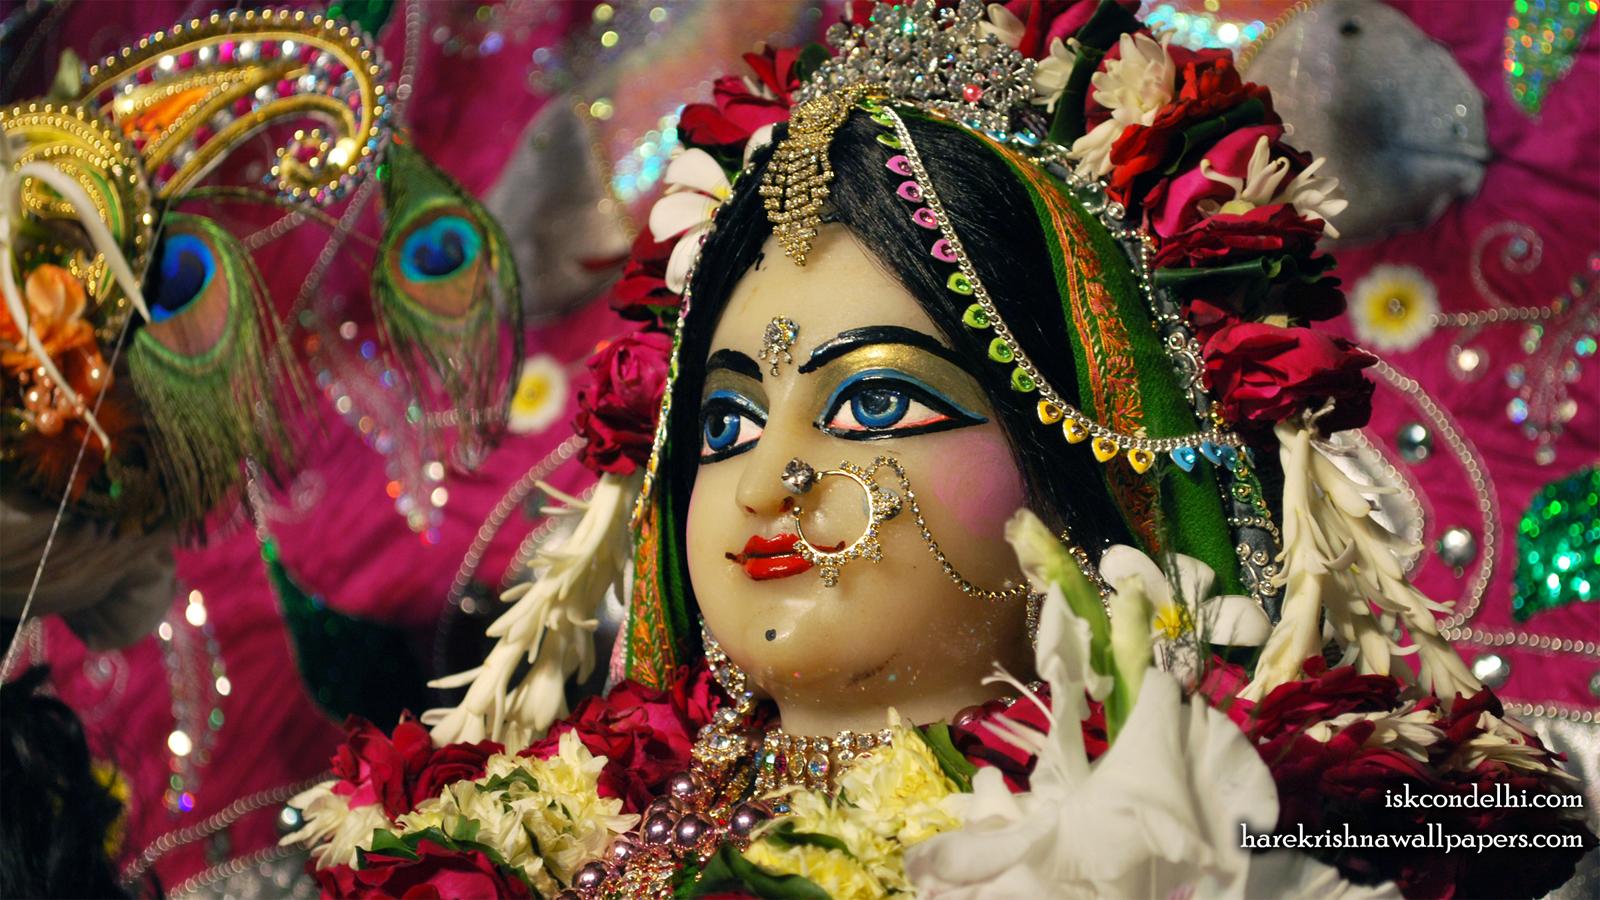 Sri Radha Close up Wallpaper (029) Size 1600x900 Download